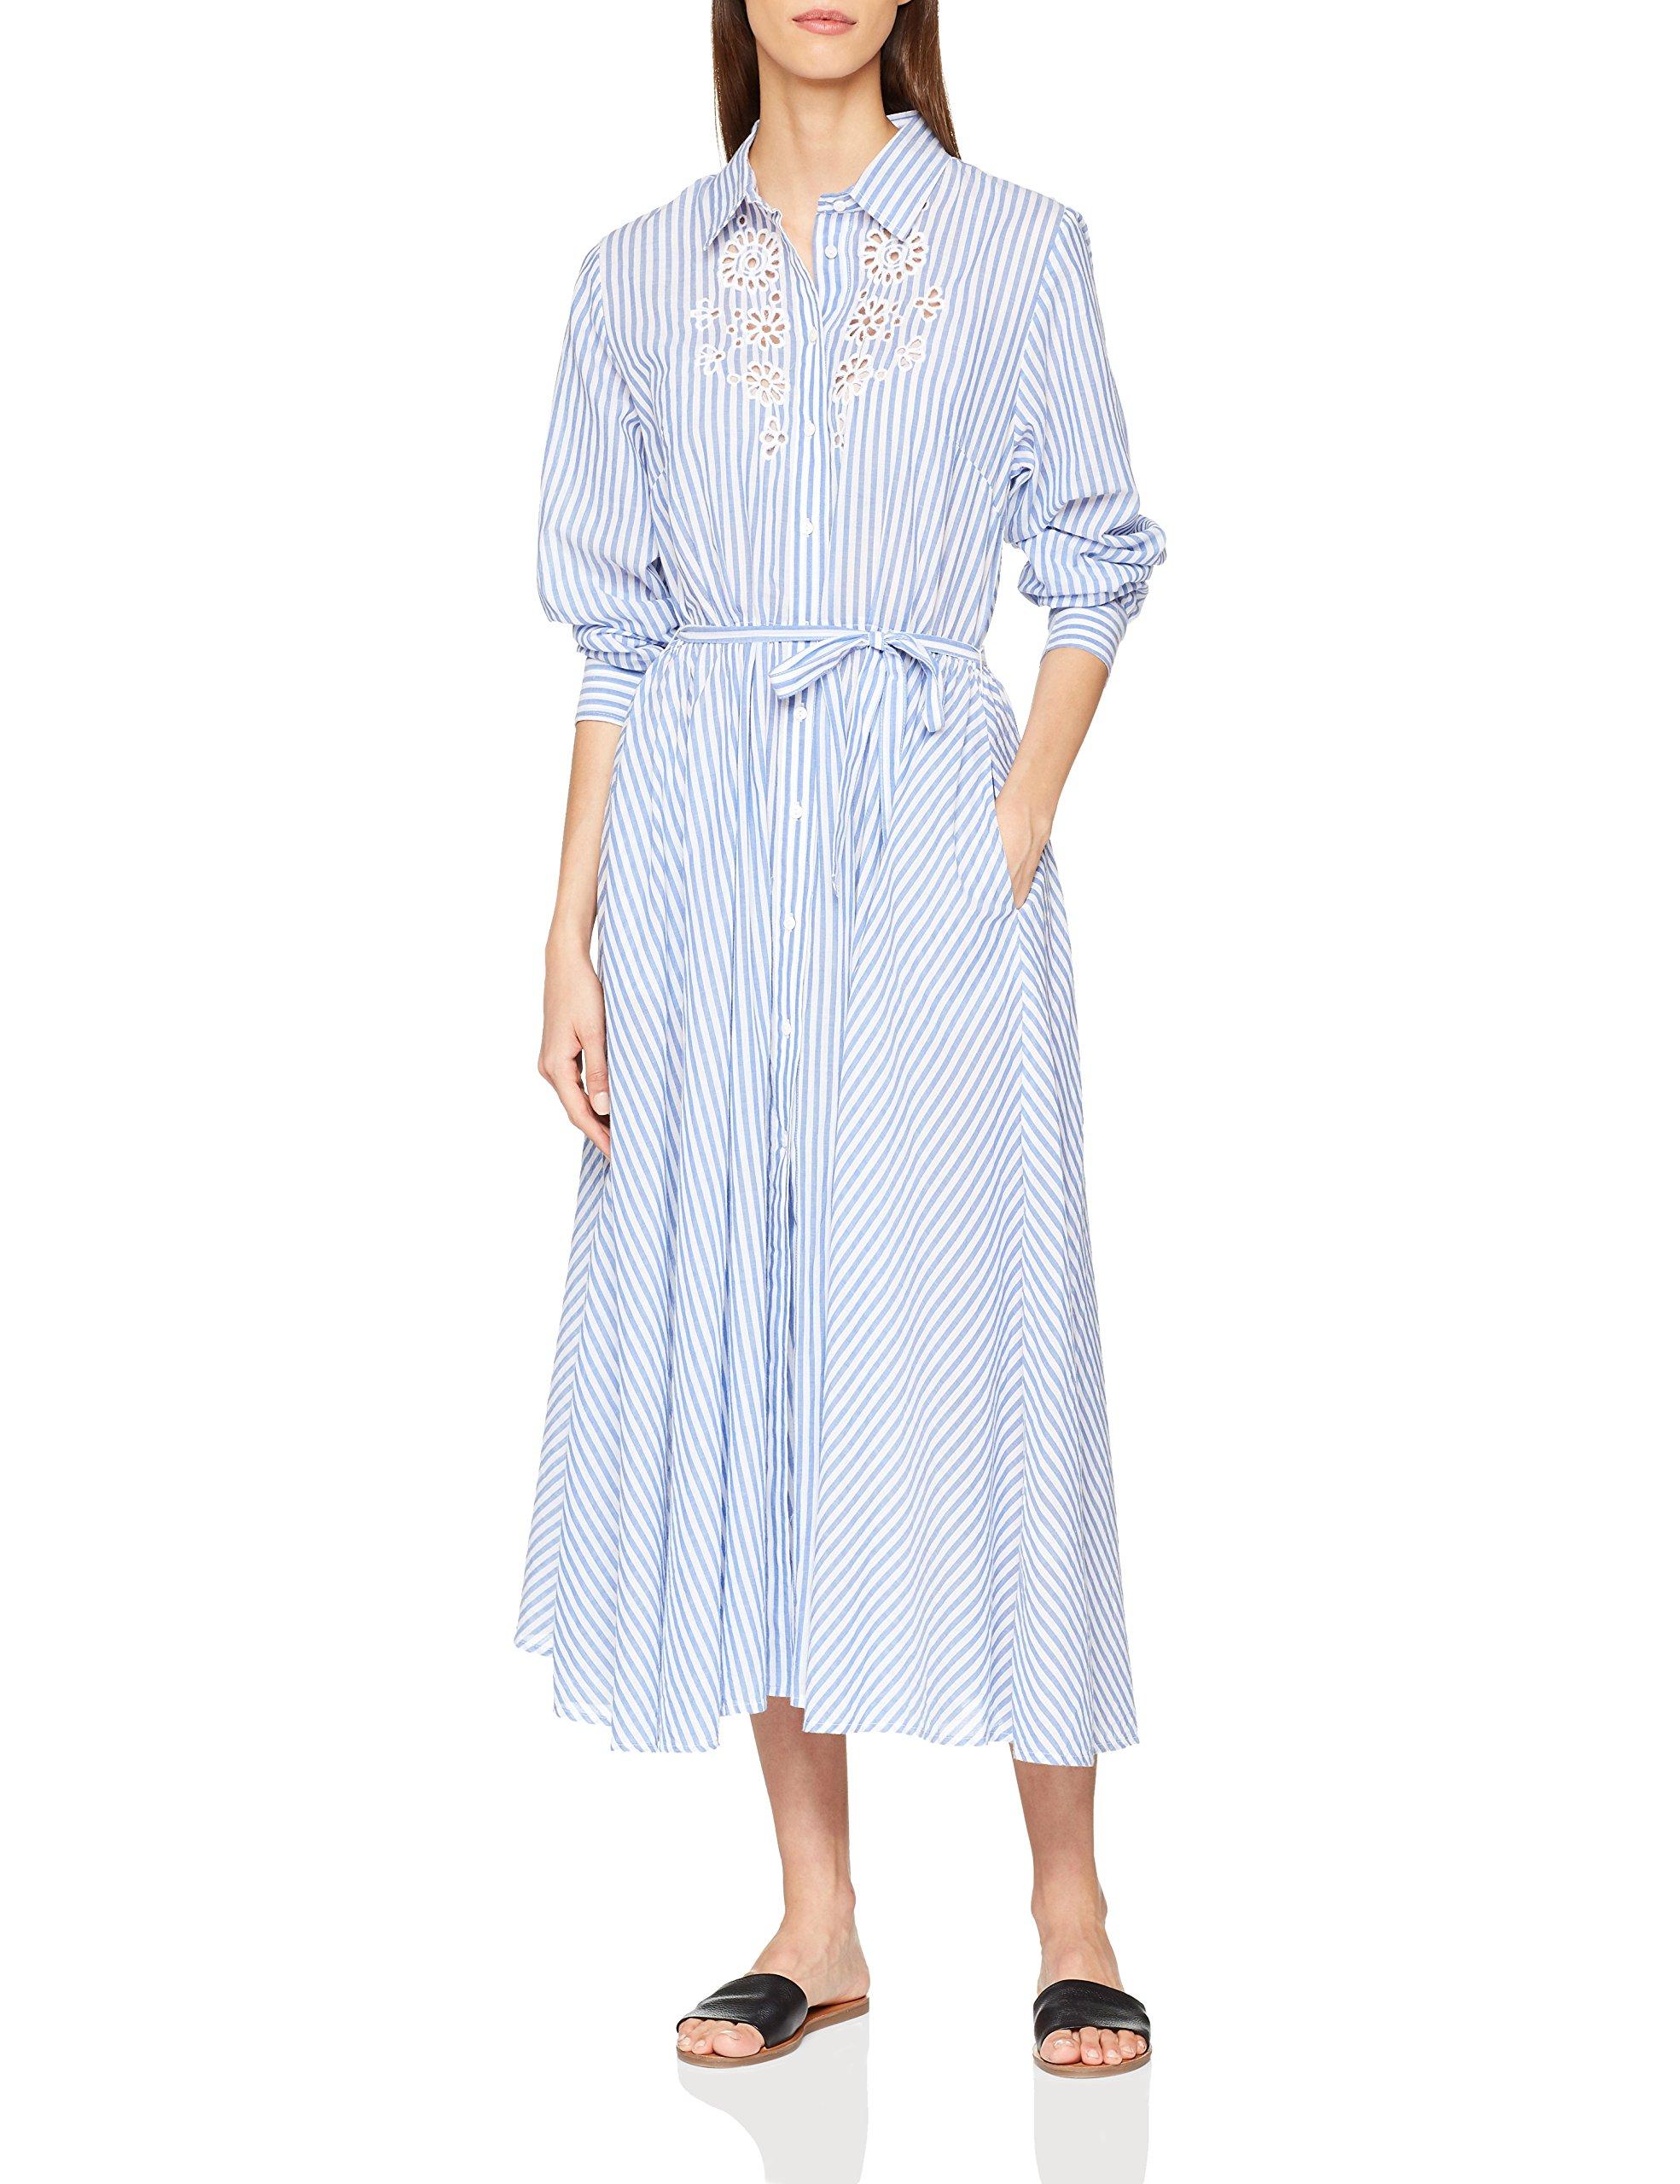 Maryna Dress Batik Fabricant40mFemme RobeMulticoloremulticoMediumtaille Antik 5L4AS3Rcqj